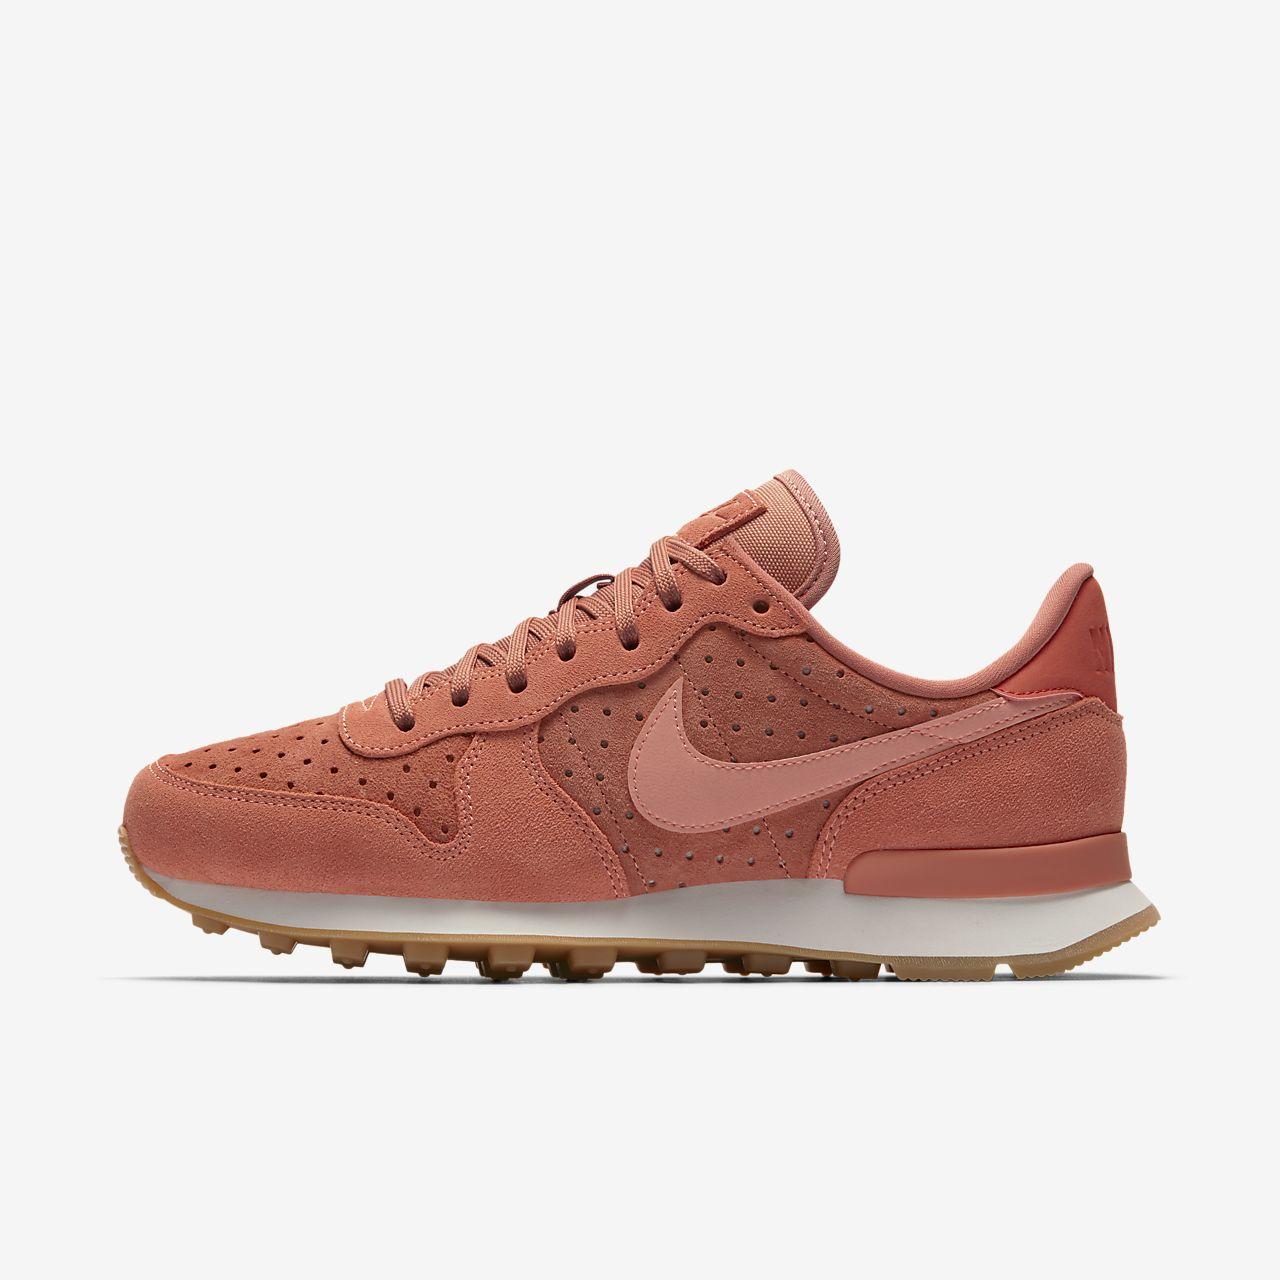 differently af430 0c388 ... sneakers 66165 d590f  new zealand nike internationalist premium womens  shoe b3bfc da6ce